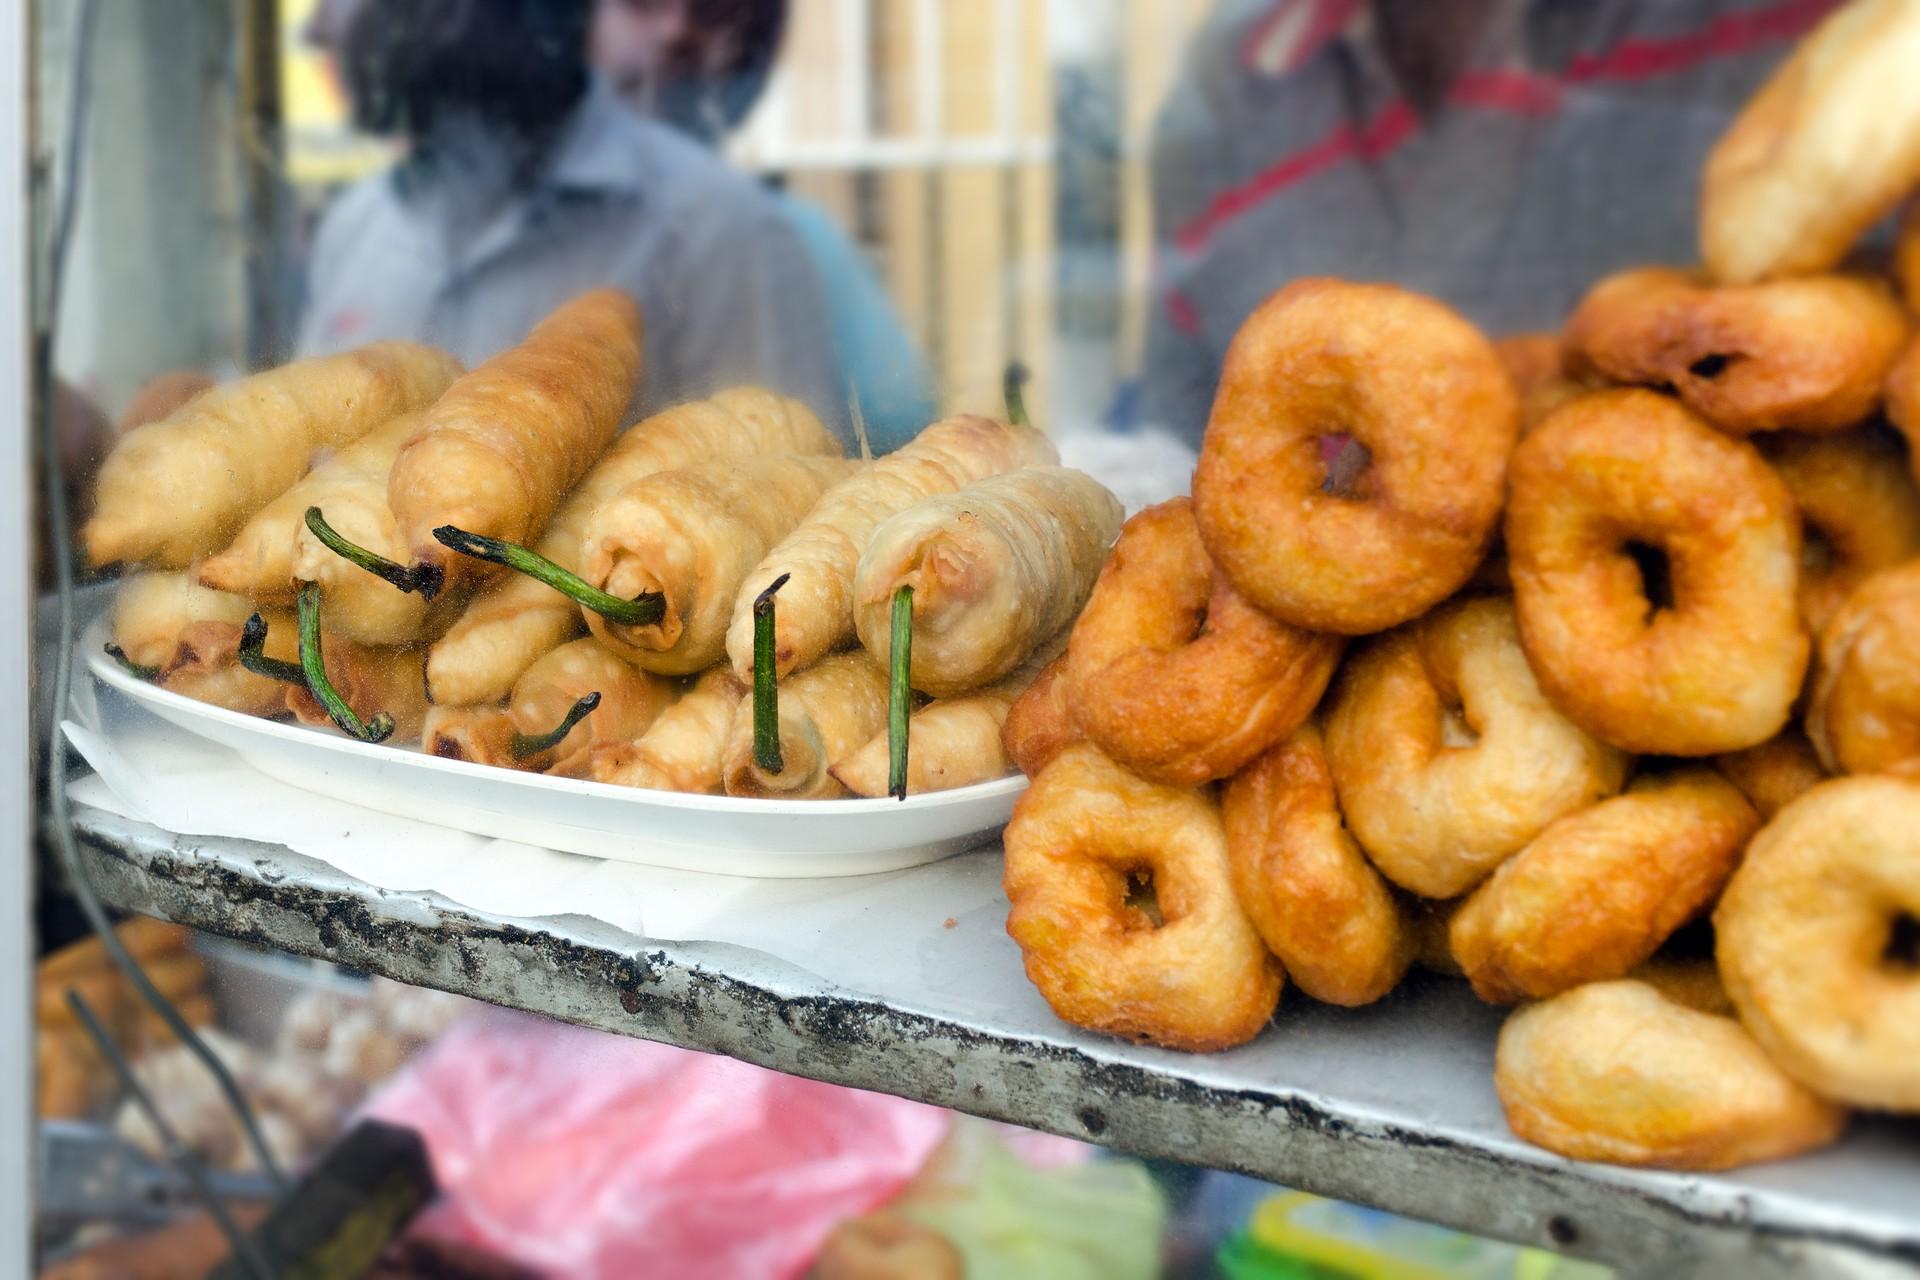 Sri Lanka food tour - street food stall in Colombo